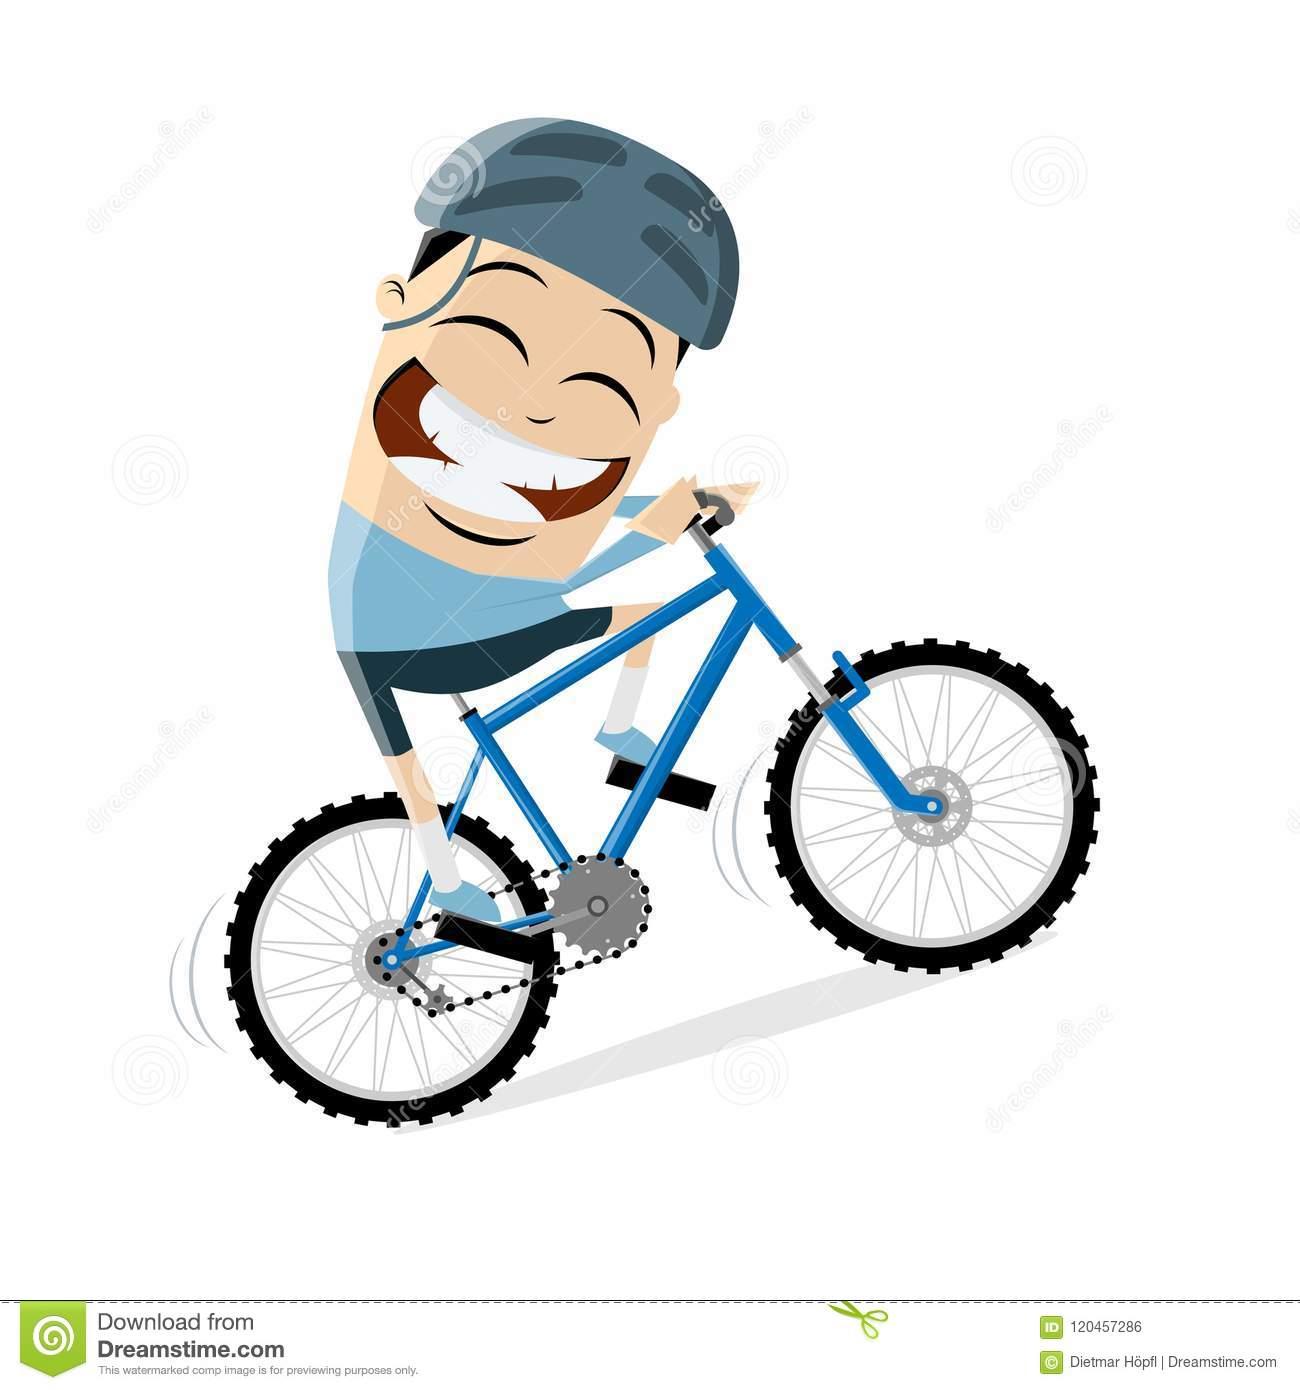 Funny Cartoon Man Is Riding A Mountain Bike Stock Vector.